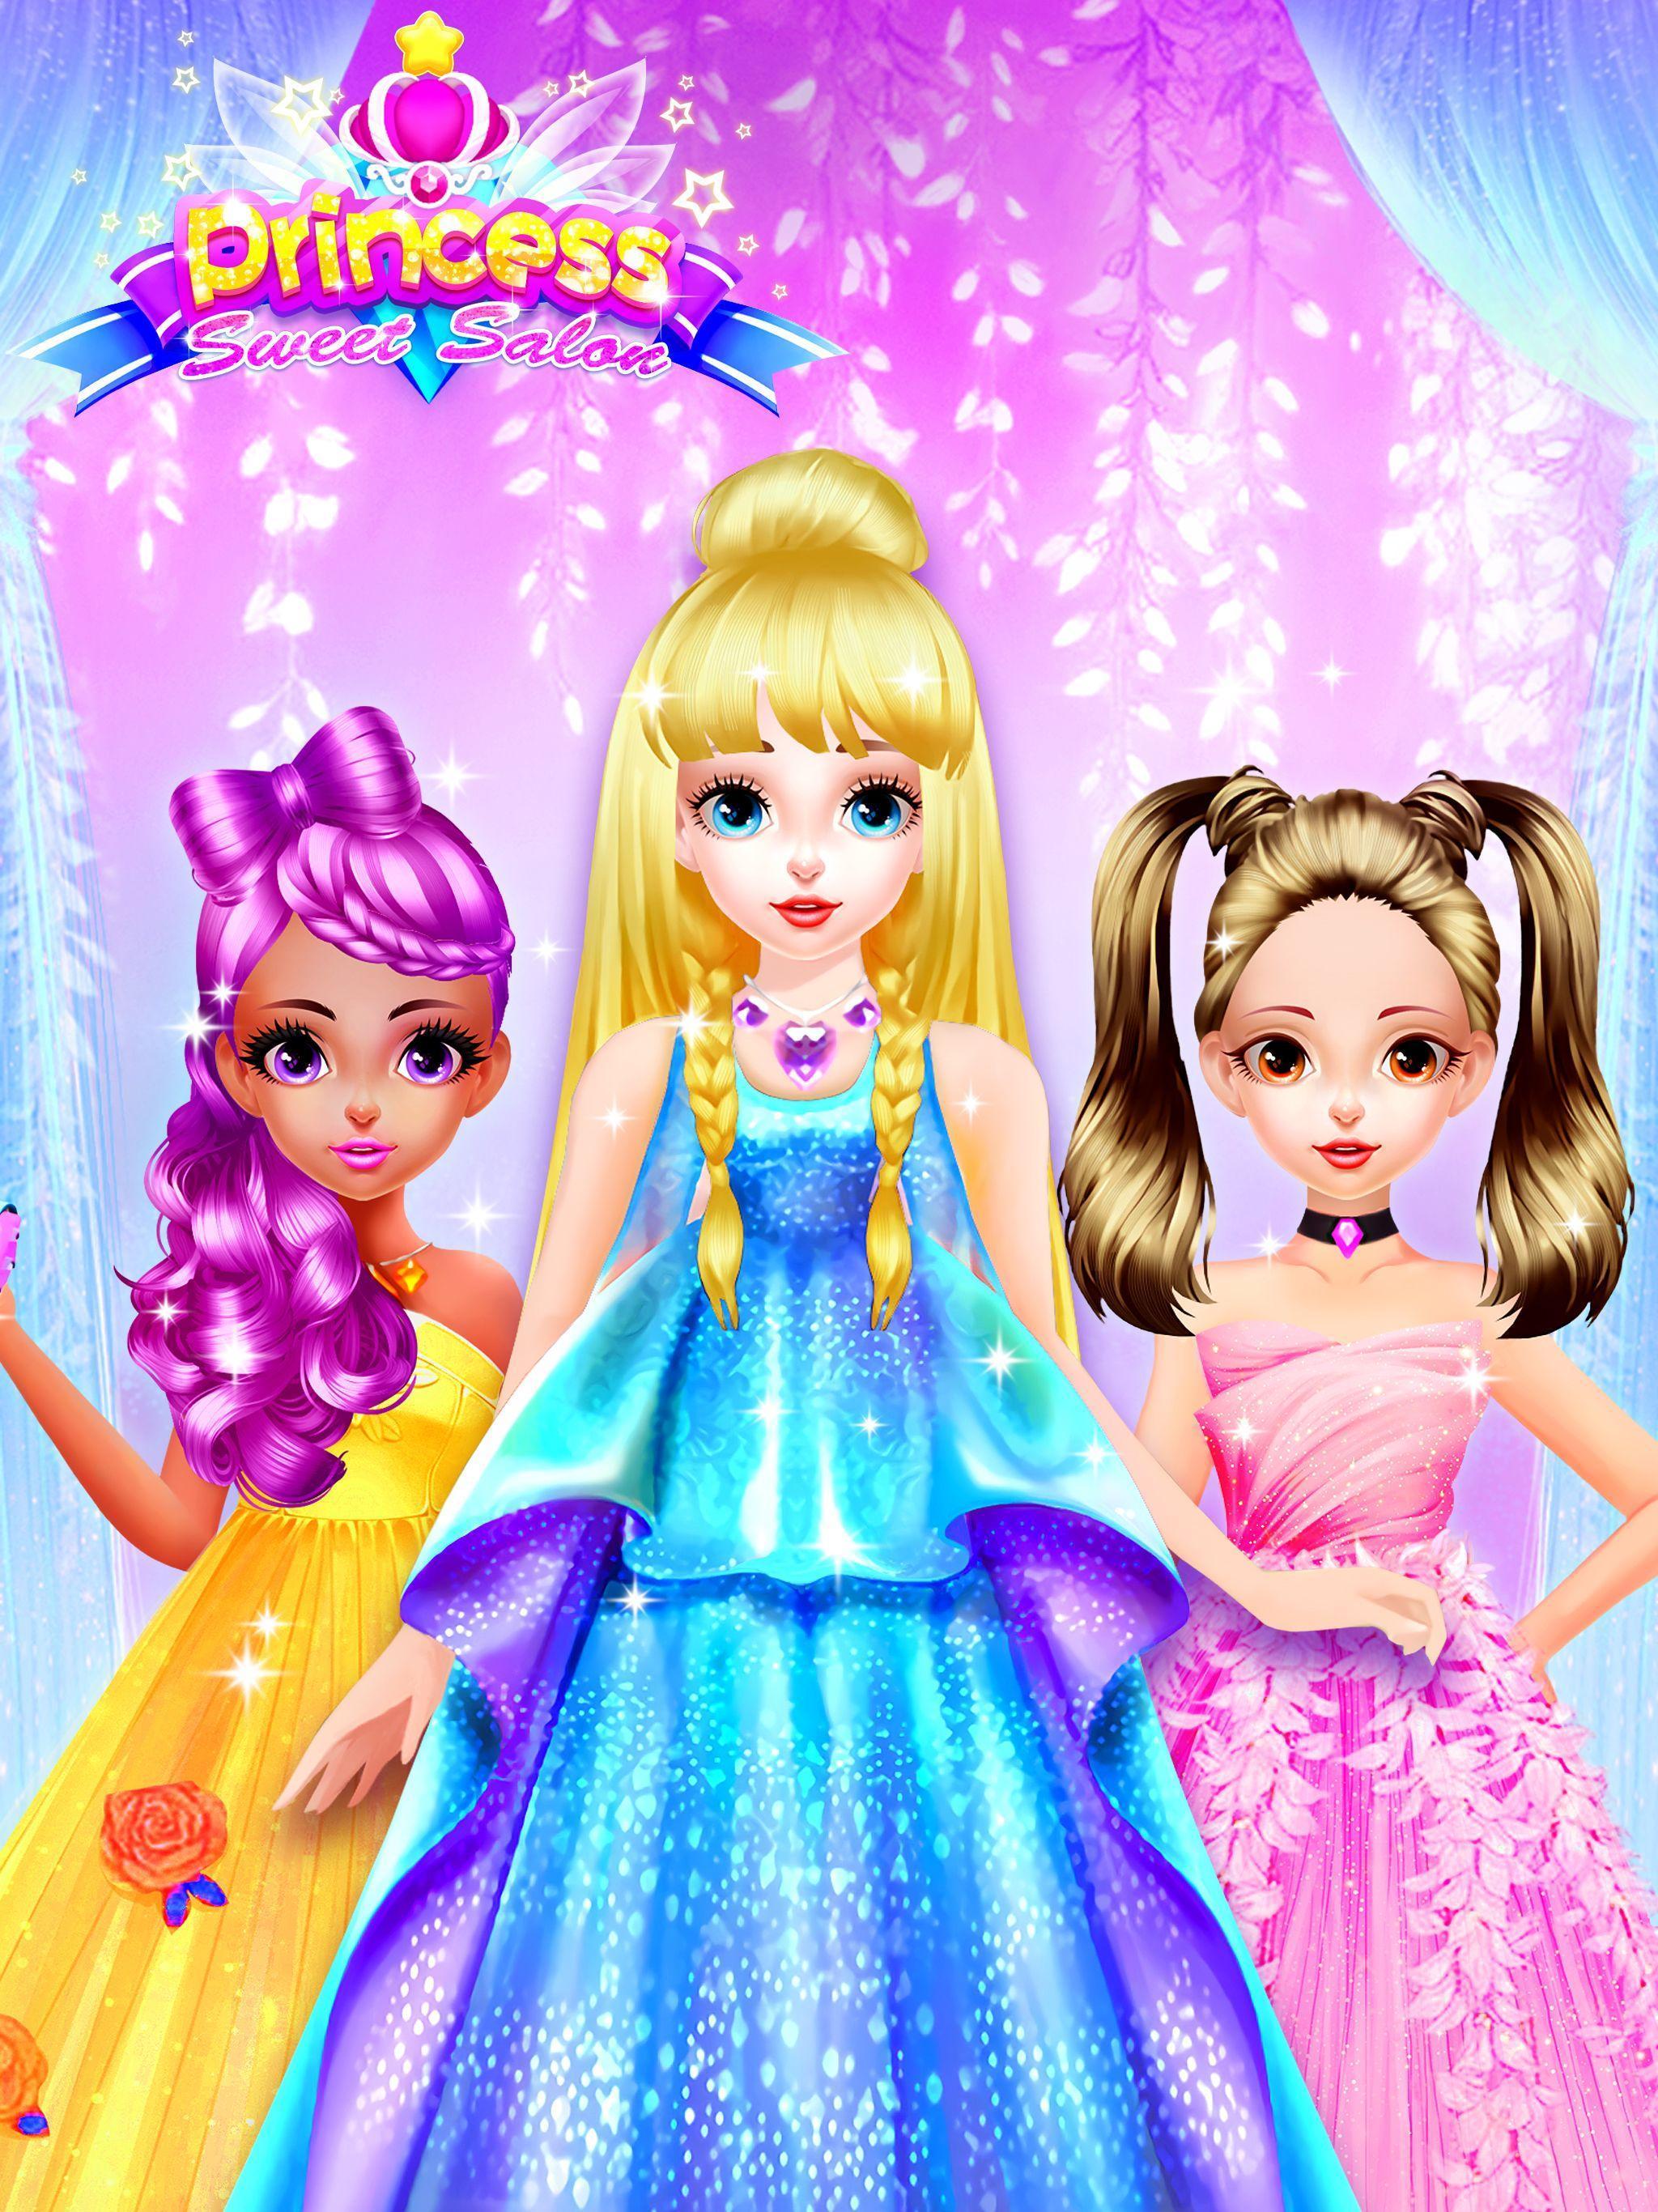 Princess Dress Up Games Makeup Salon For Android Apk Download